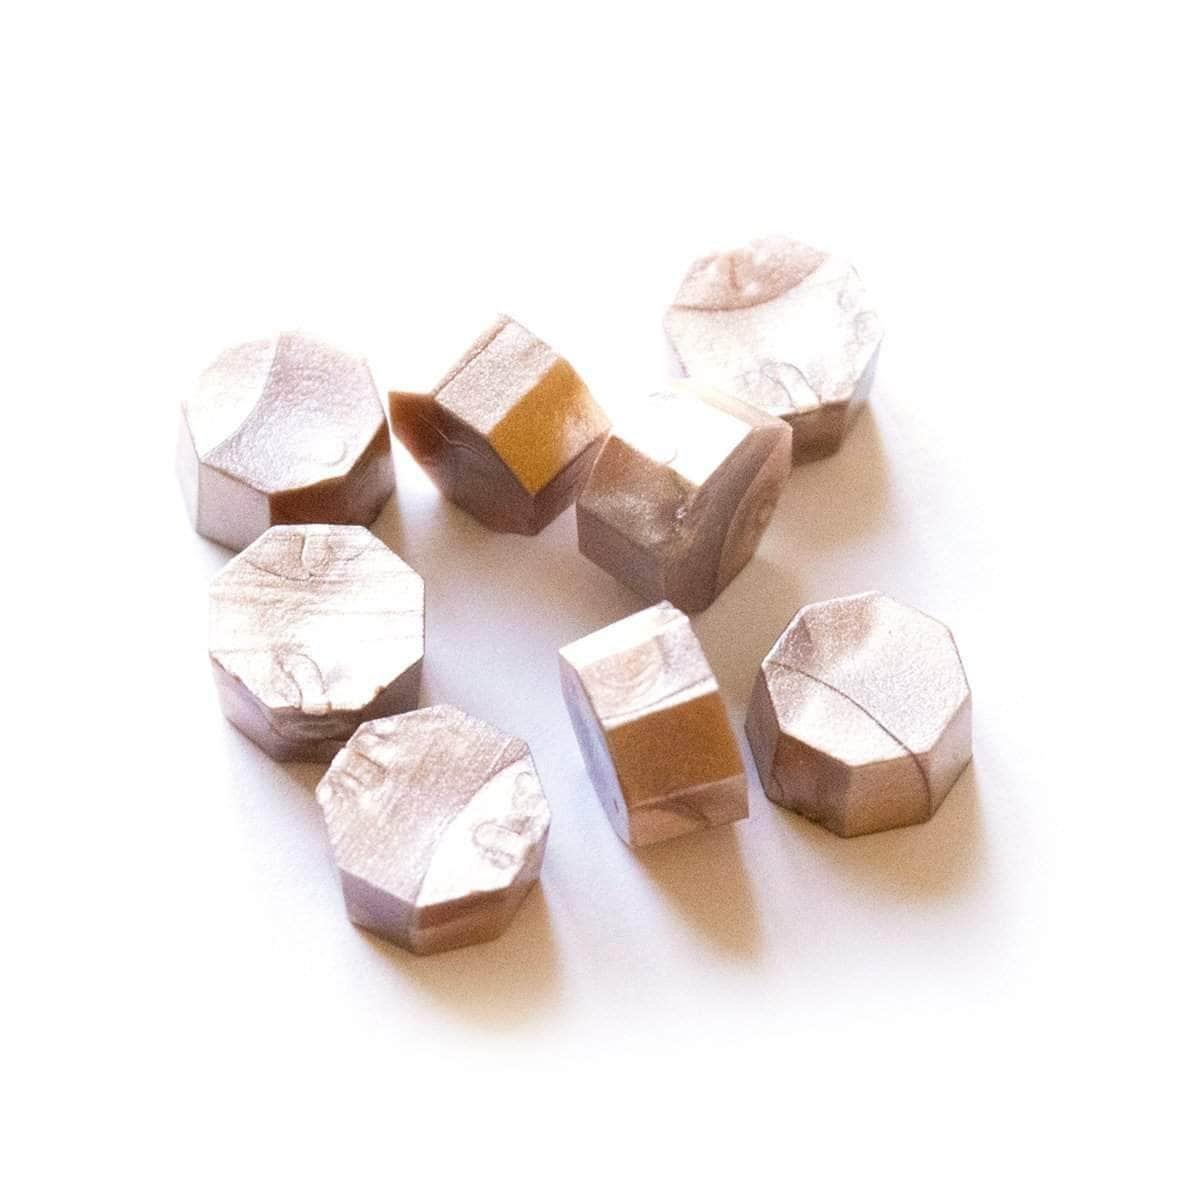 Altenew - Rose Gold Wax Beads